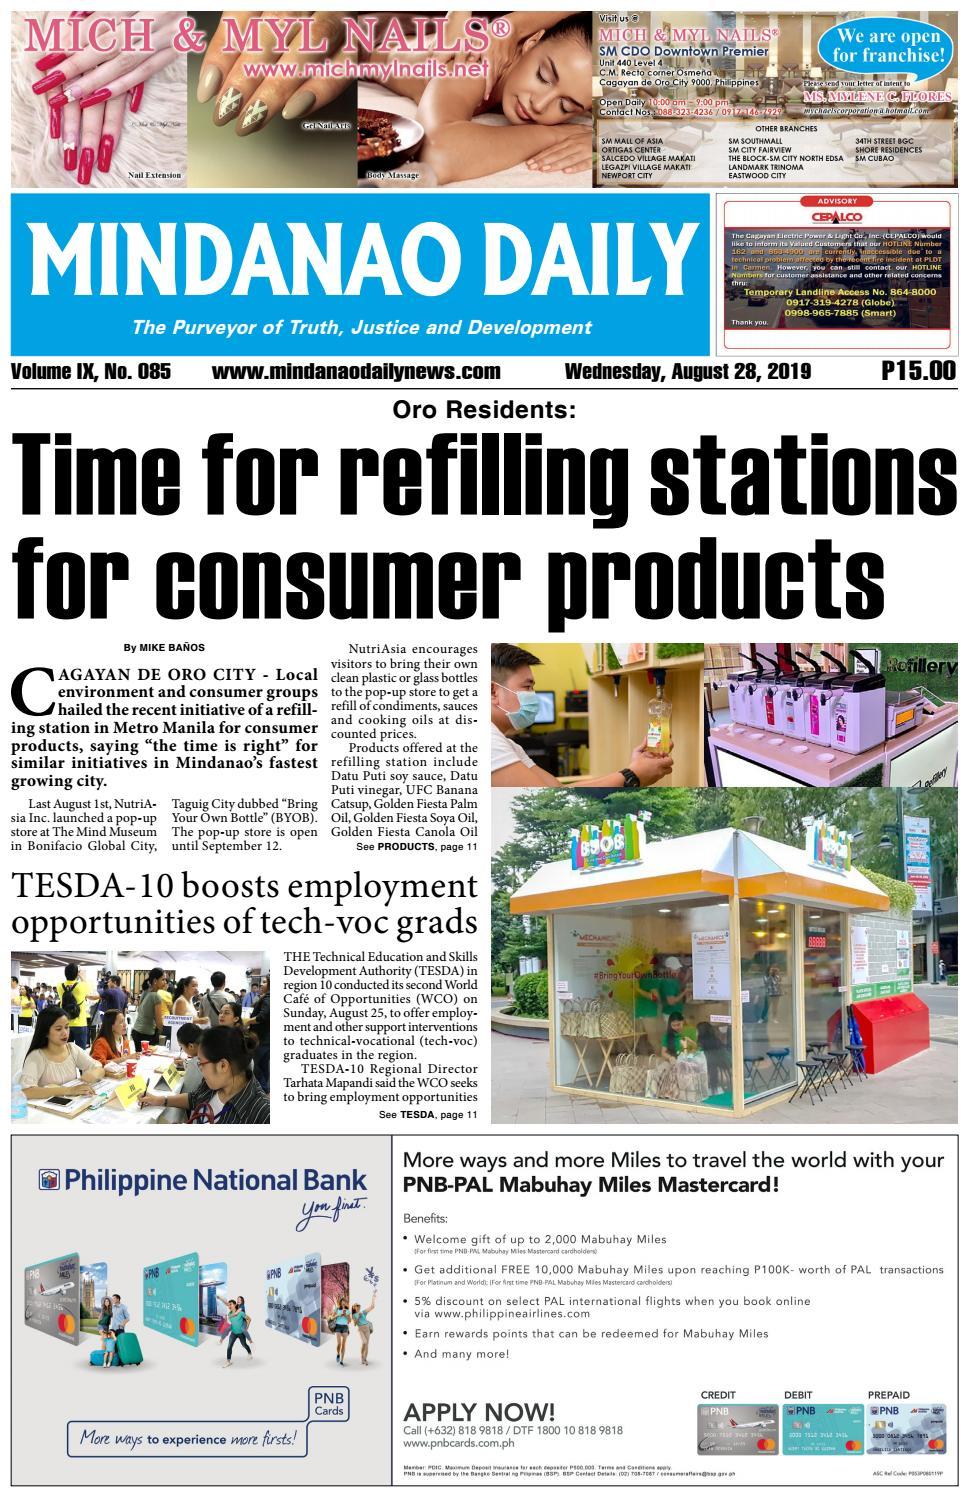 Mindanao Daily (August 28, 2019) by Mindanao Daily News - issuu